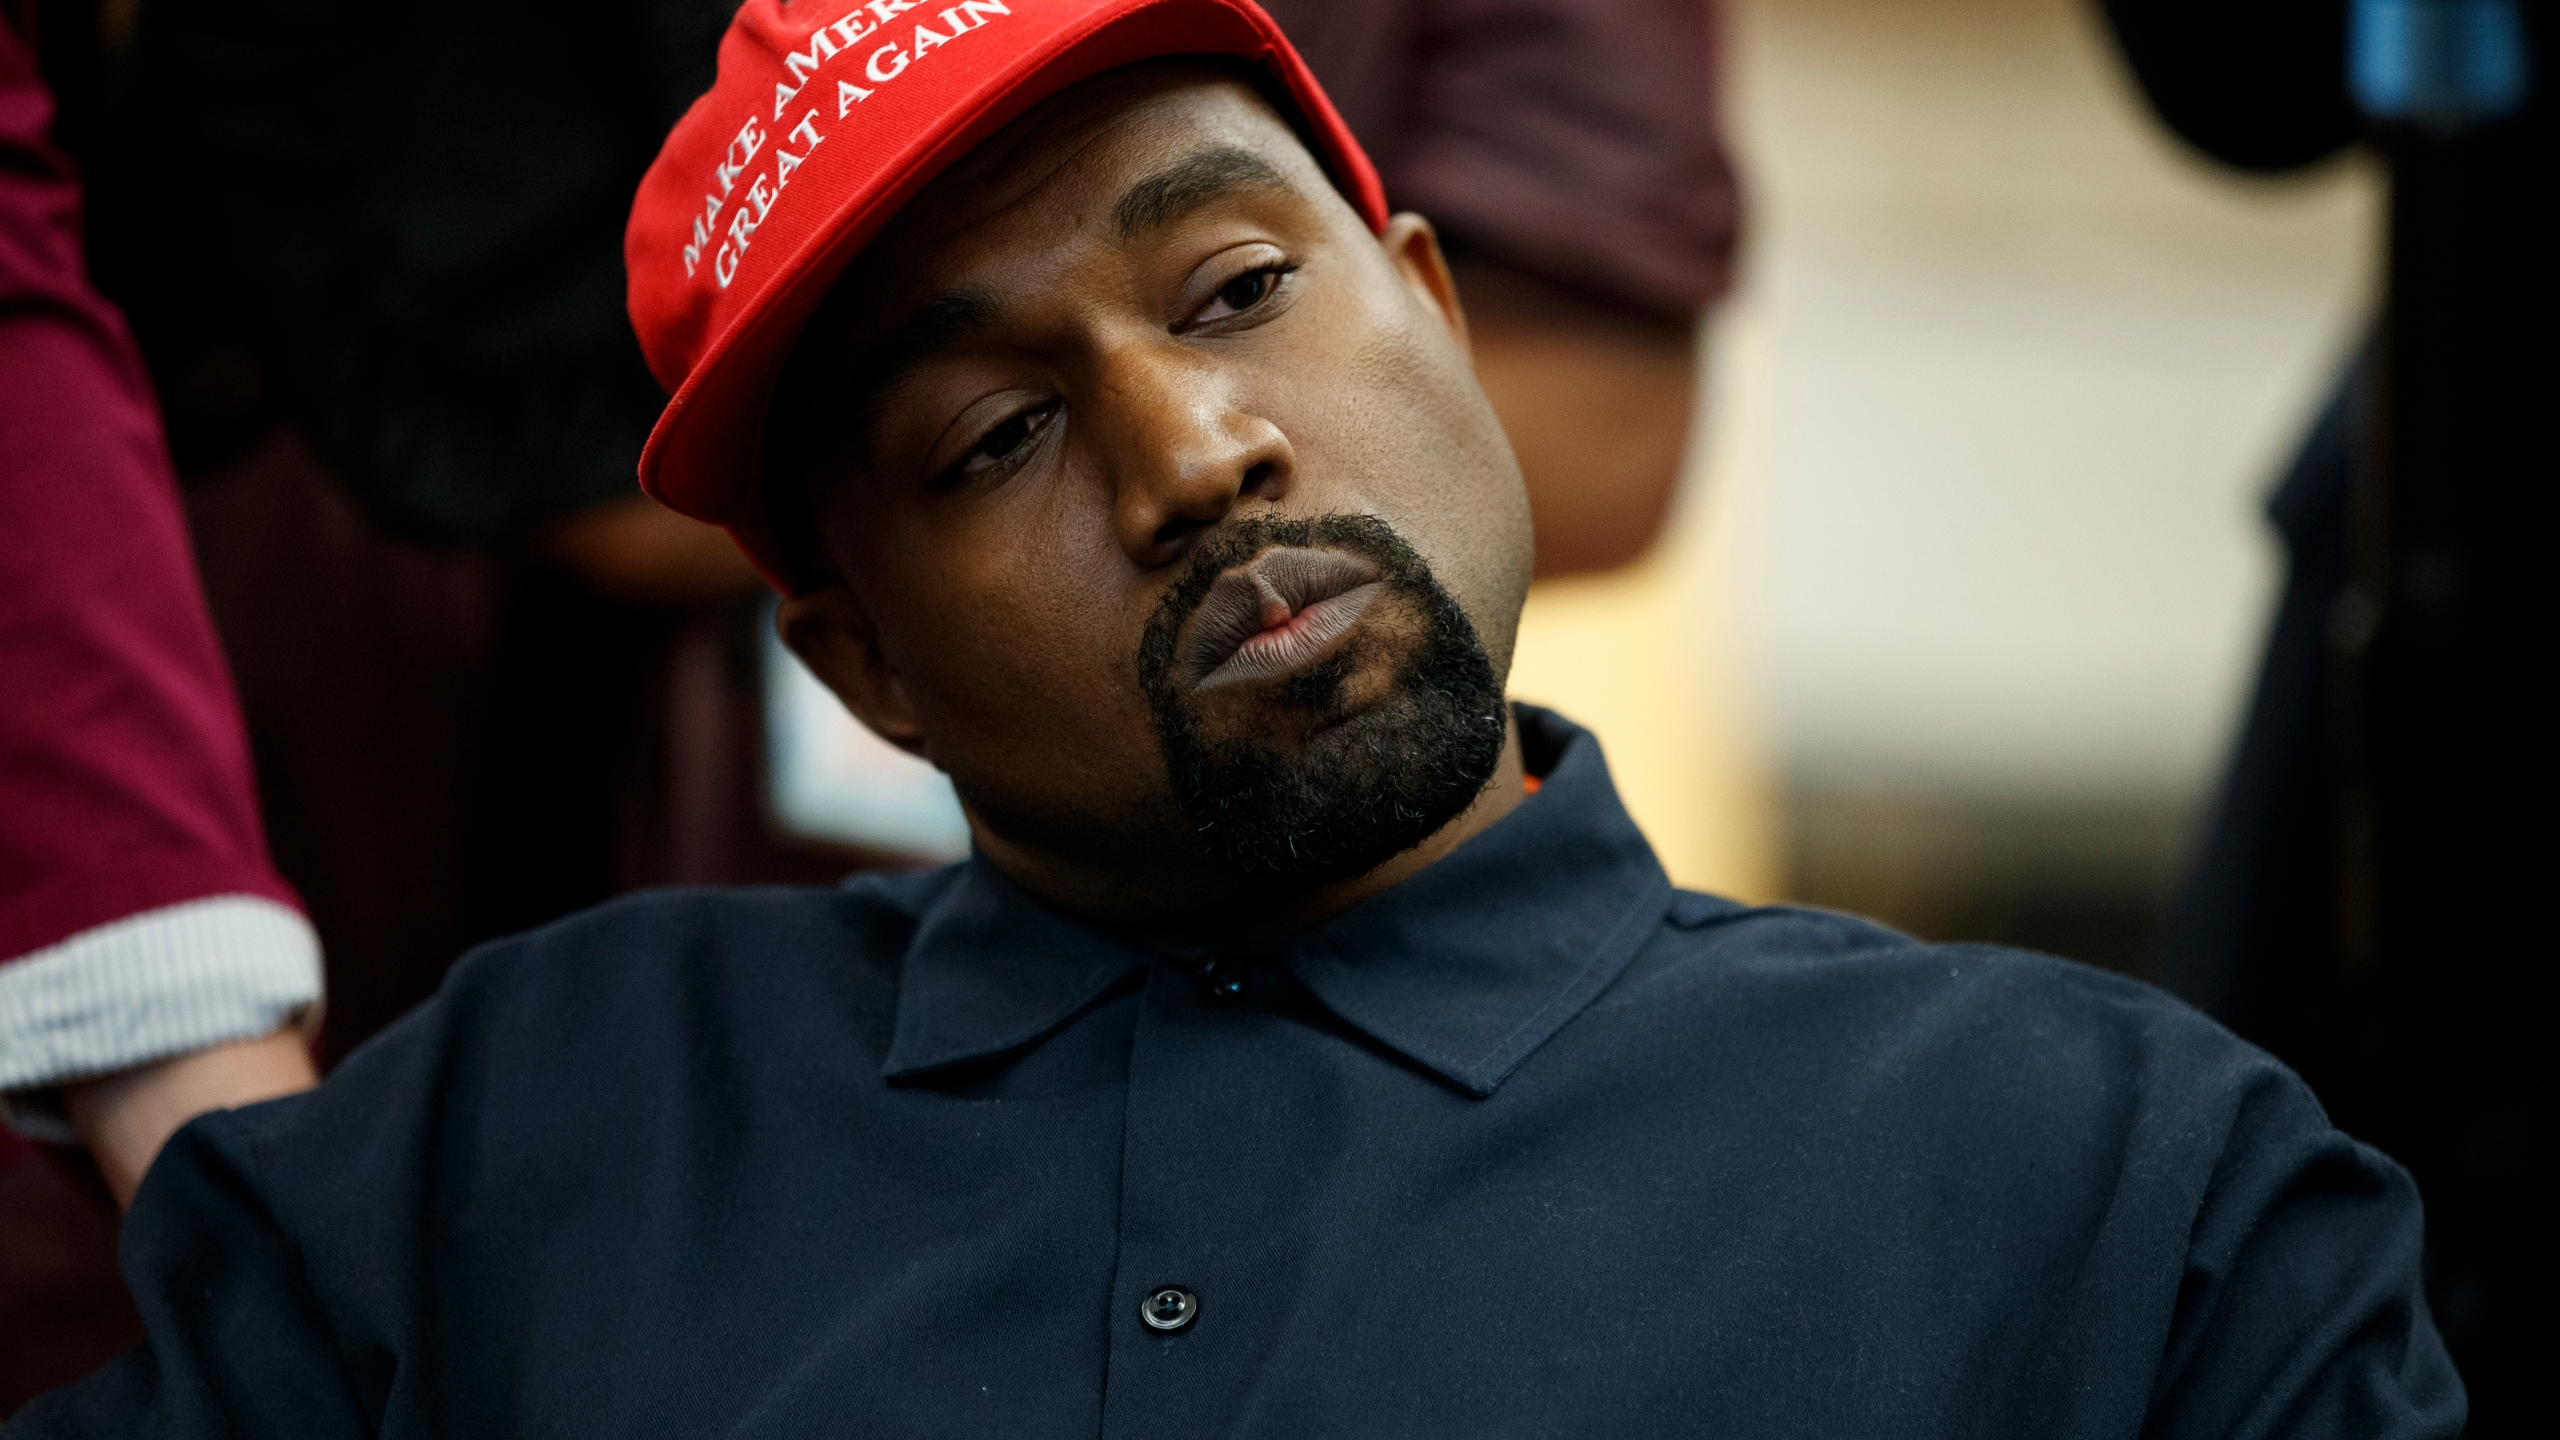 Trump_Kanye_West_19815-159532.jpg63172499